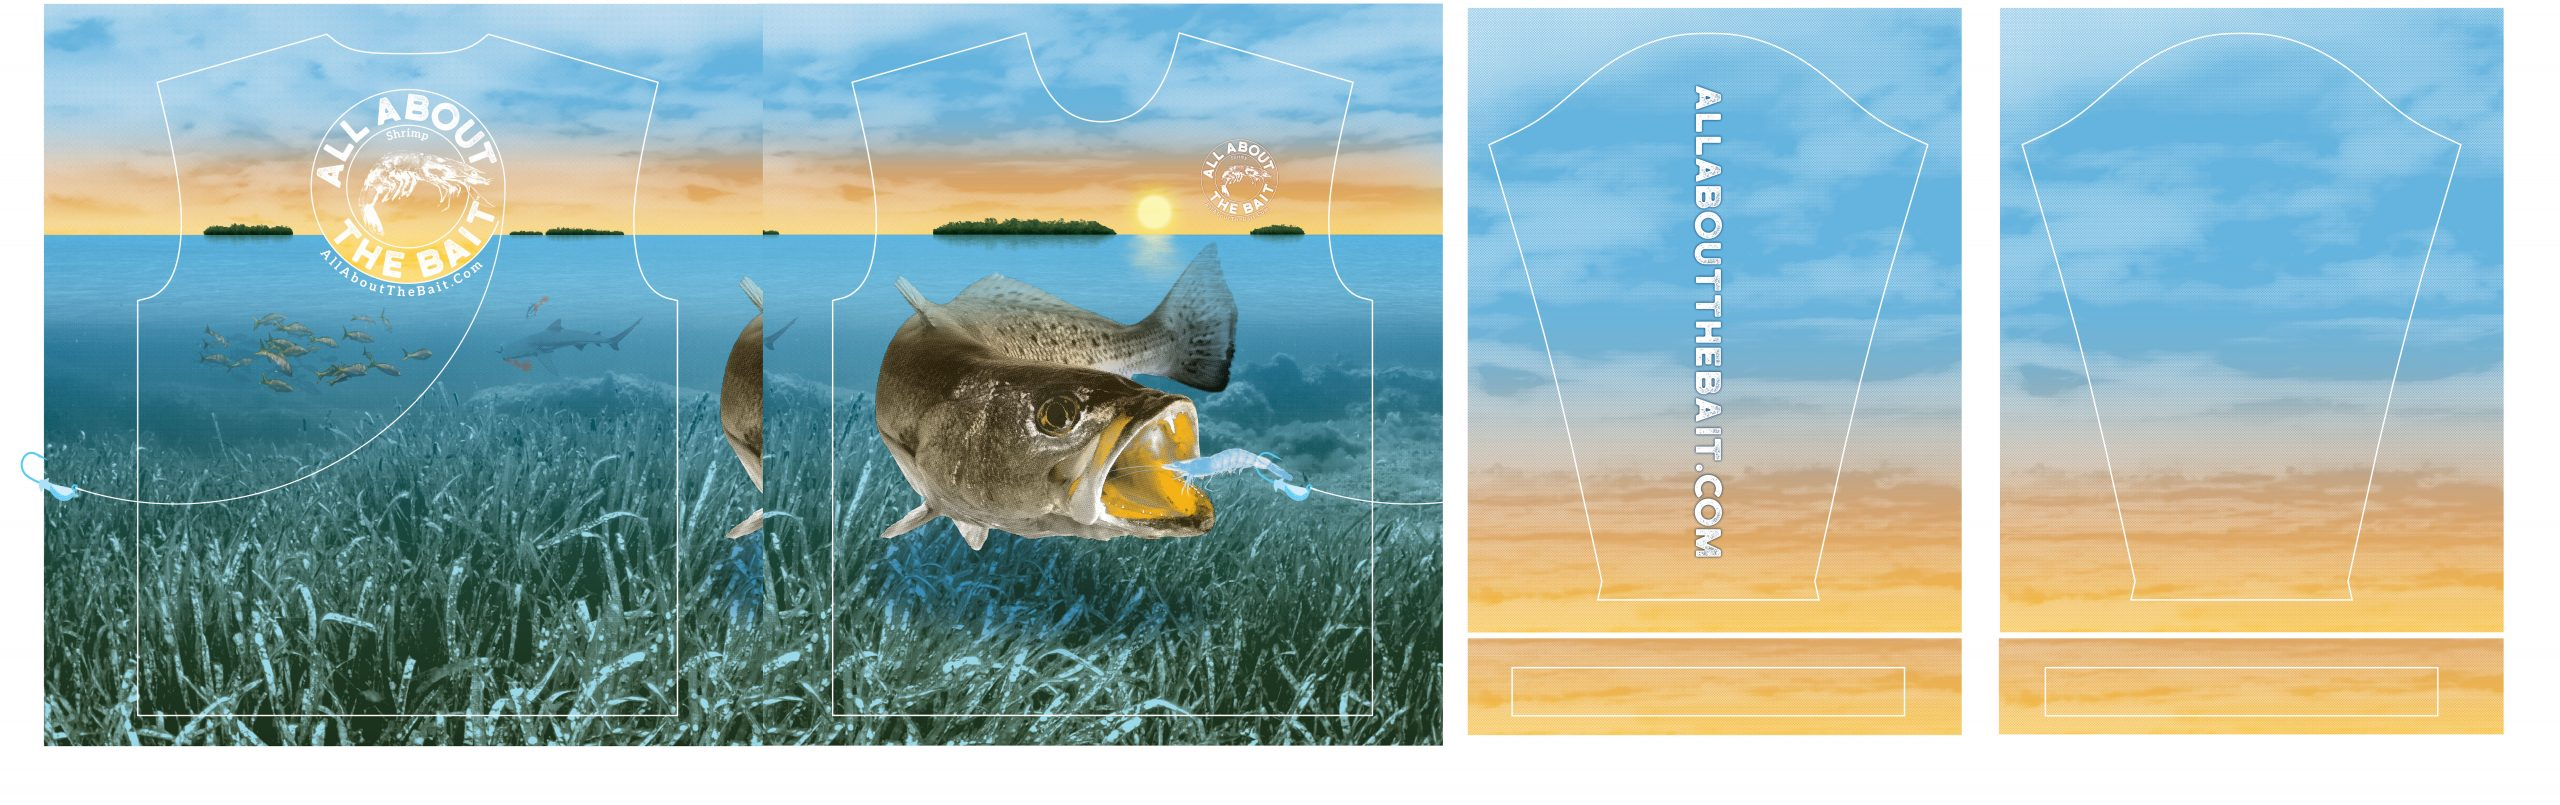 Speckled Trout Fishing Shirt Production Art - jeffthedesigner.com